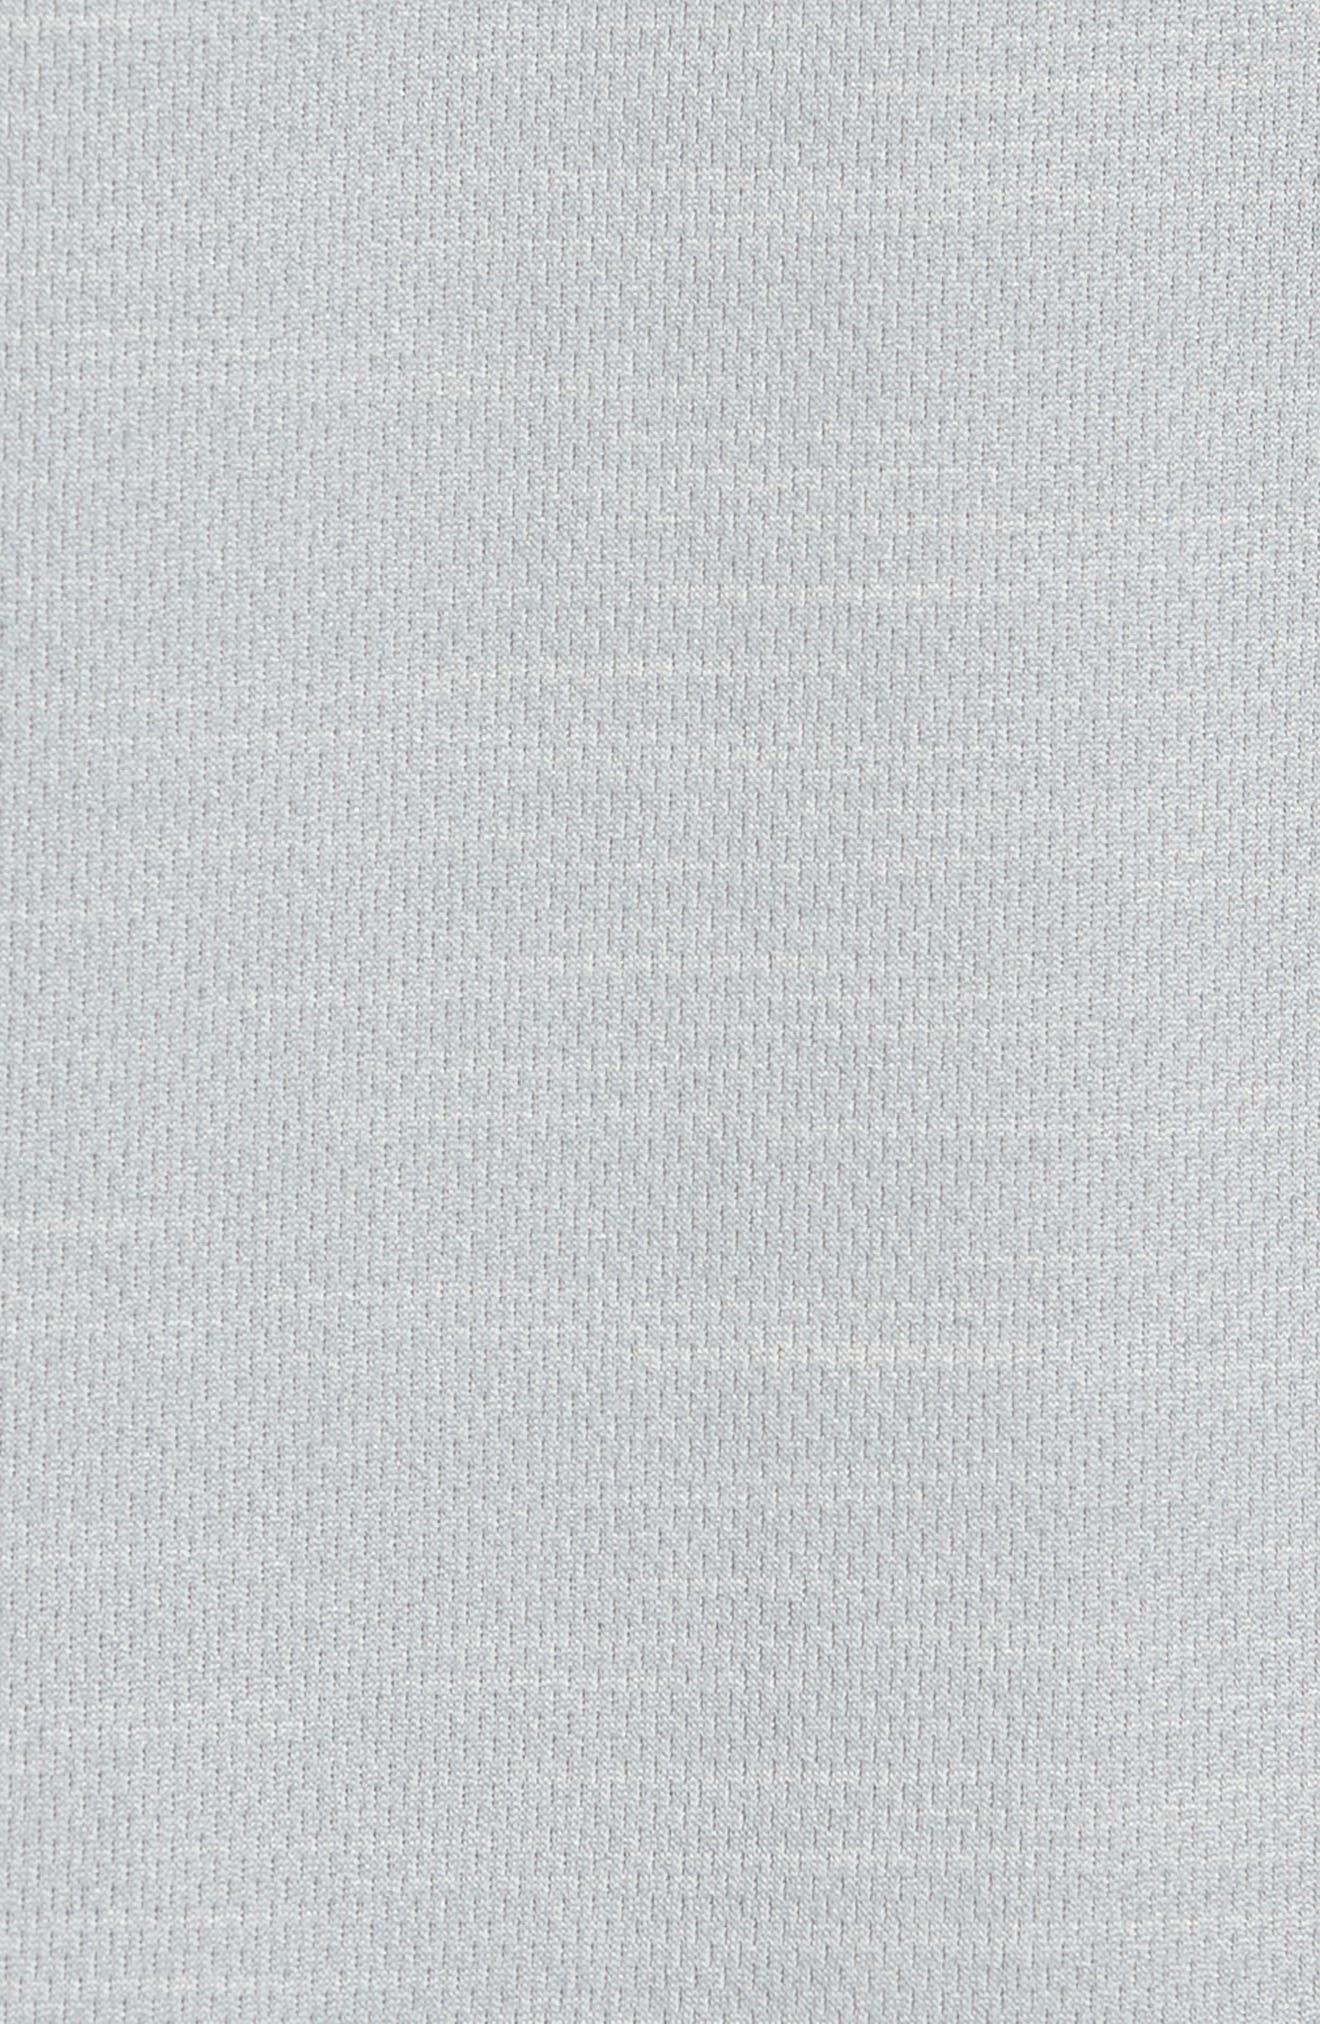 Hooded Pullover,                             Alternate thumbnail 5, color,                             GREY ZIRCON SPACEDYE